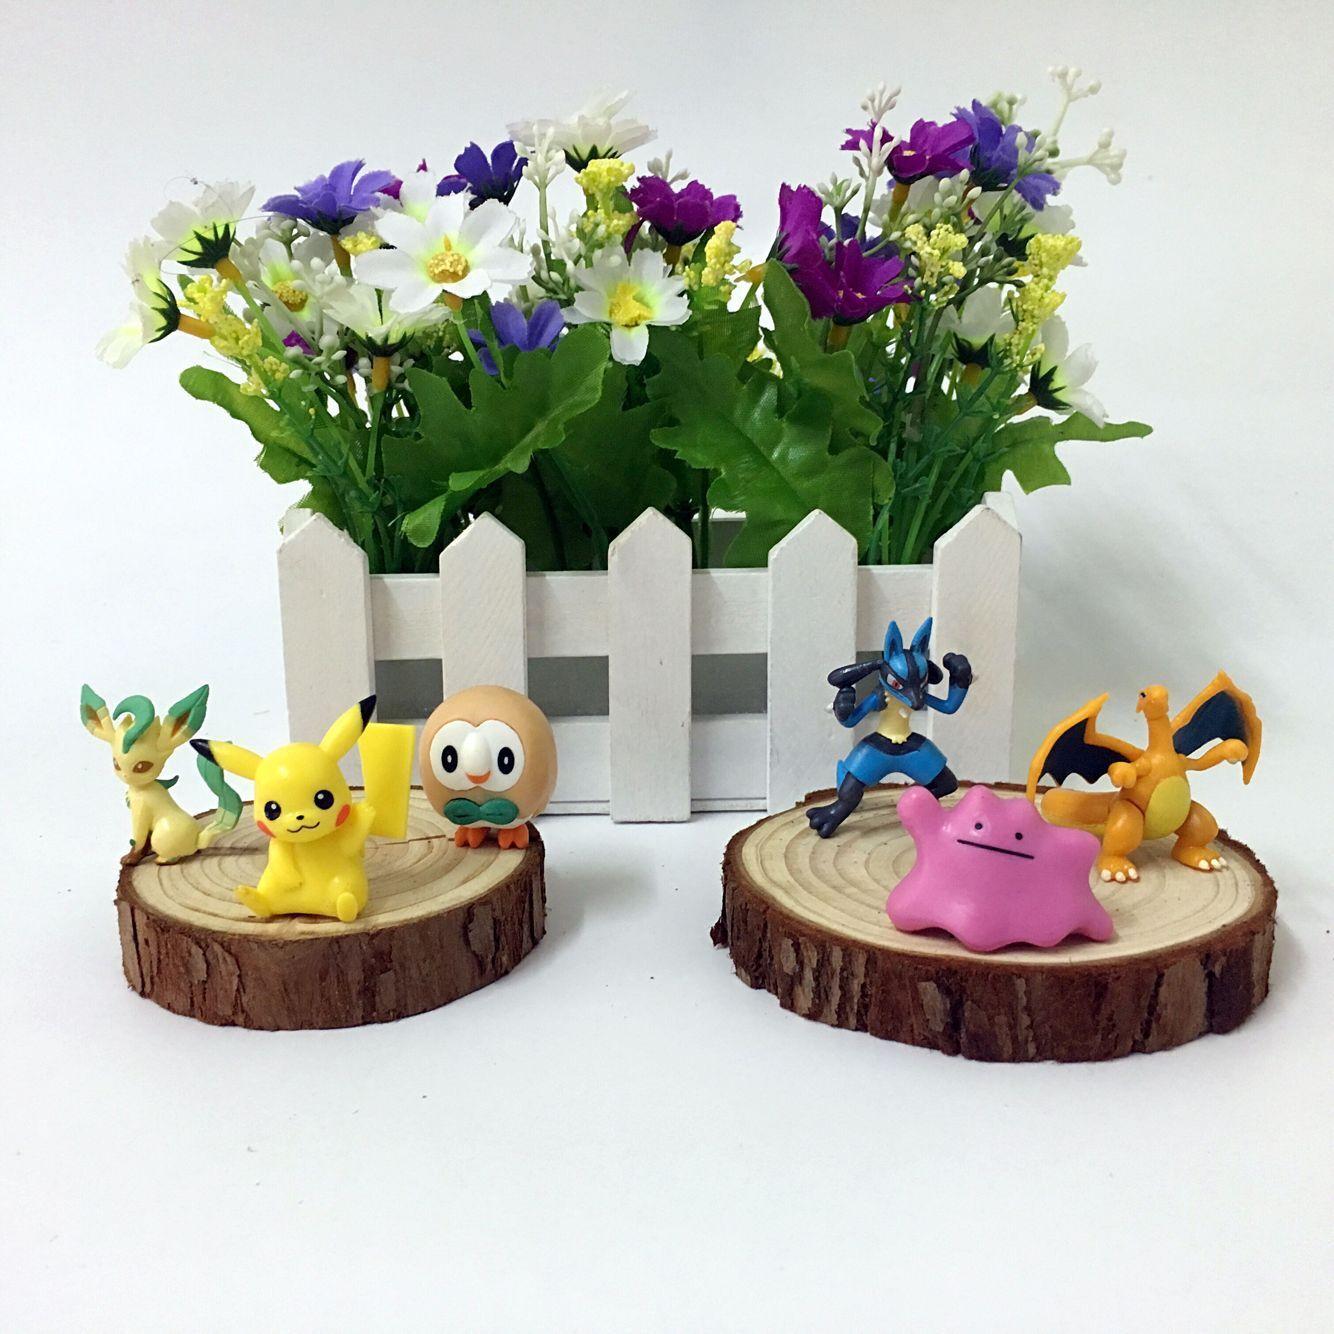 Takara Tomy Pokemon Charmander Popplio Litten Pikachu Rowlet Treecko Eevee Fennekin Greninja Аниме фигурки куклы игрушки